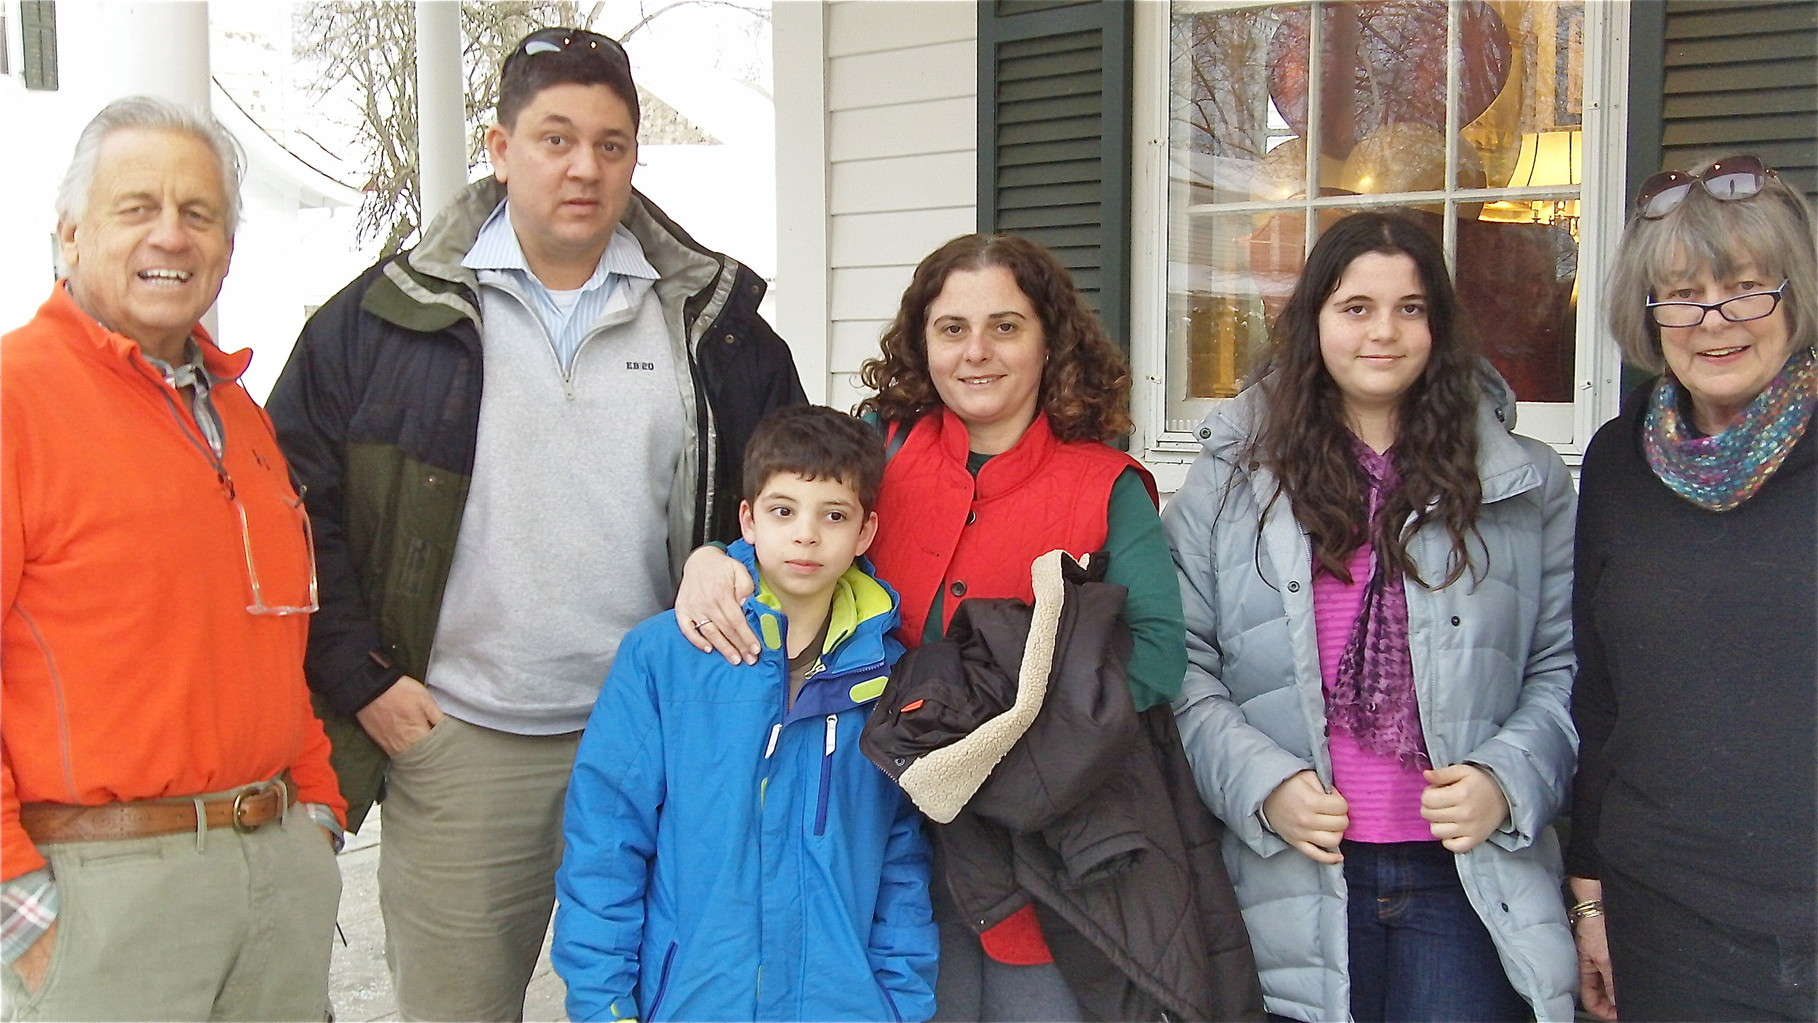 Stuart Kagel (Birthday Boy!), Bevin, Louis, Ani, Isabelle Cherot & Kathy (Kagel) Hutchins